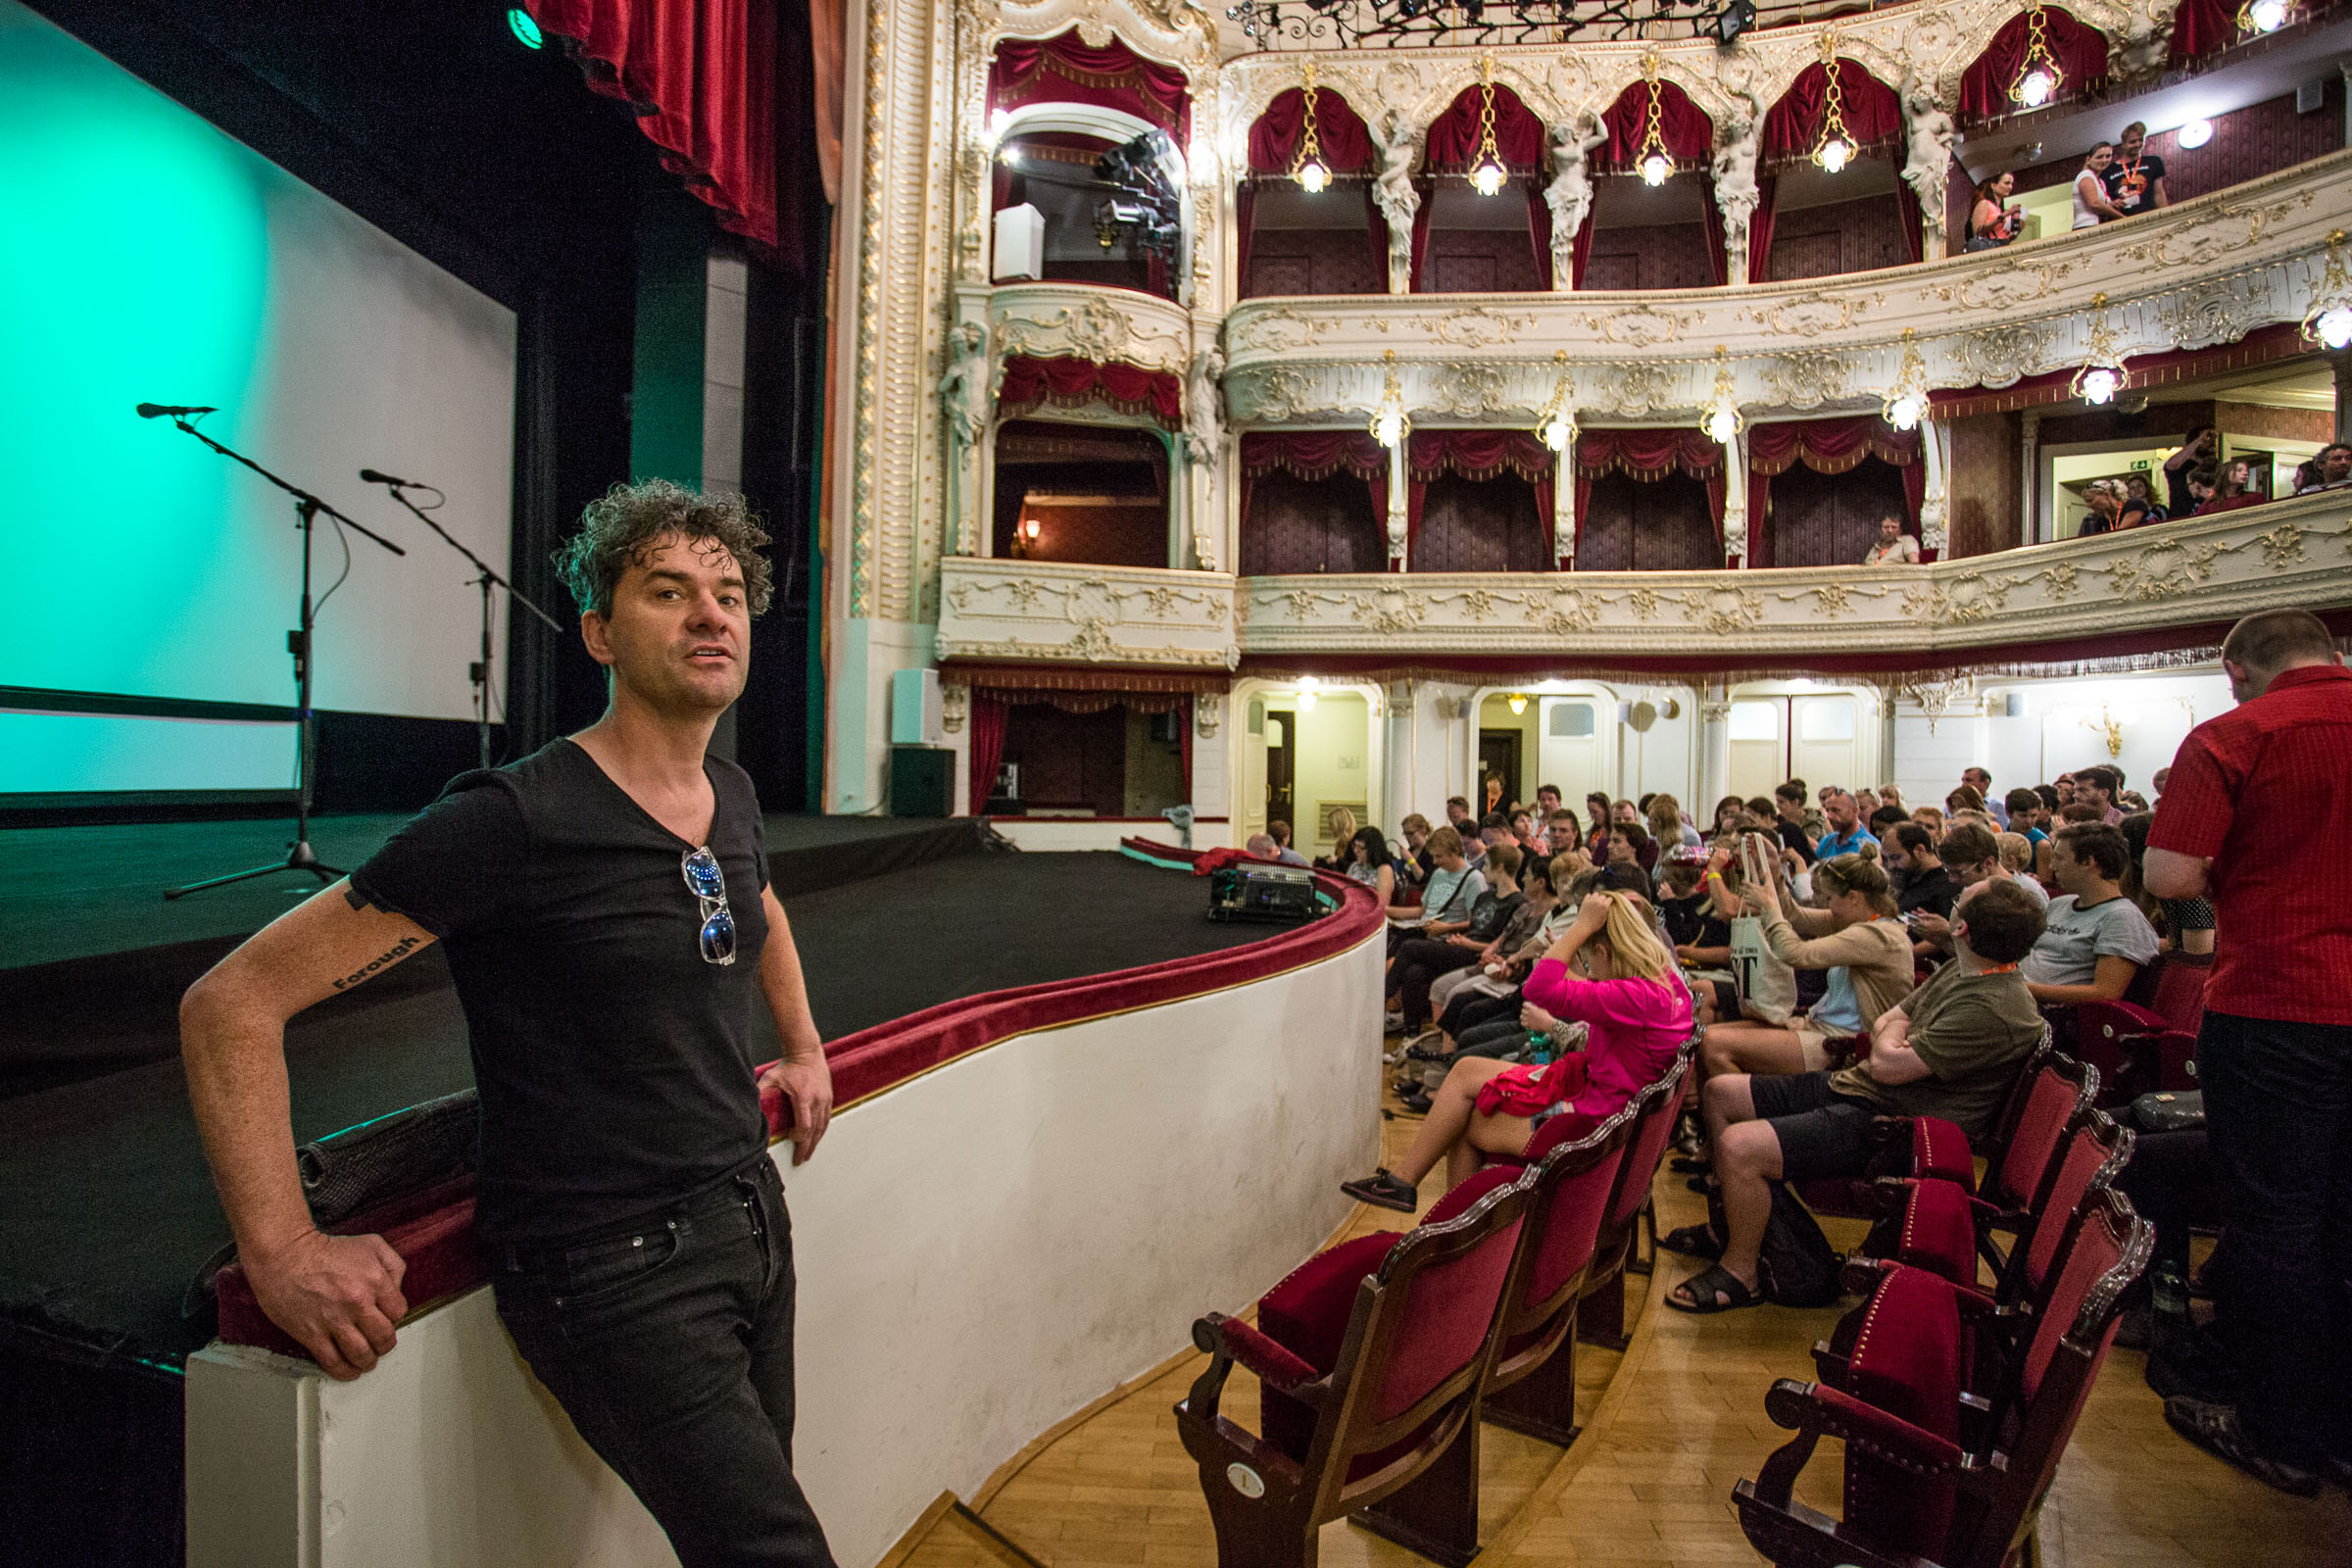 Mark Cousins at the Karlovy Vary International Film Festival, 2015.